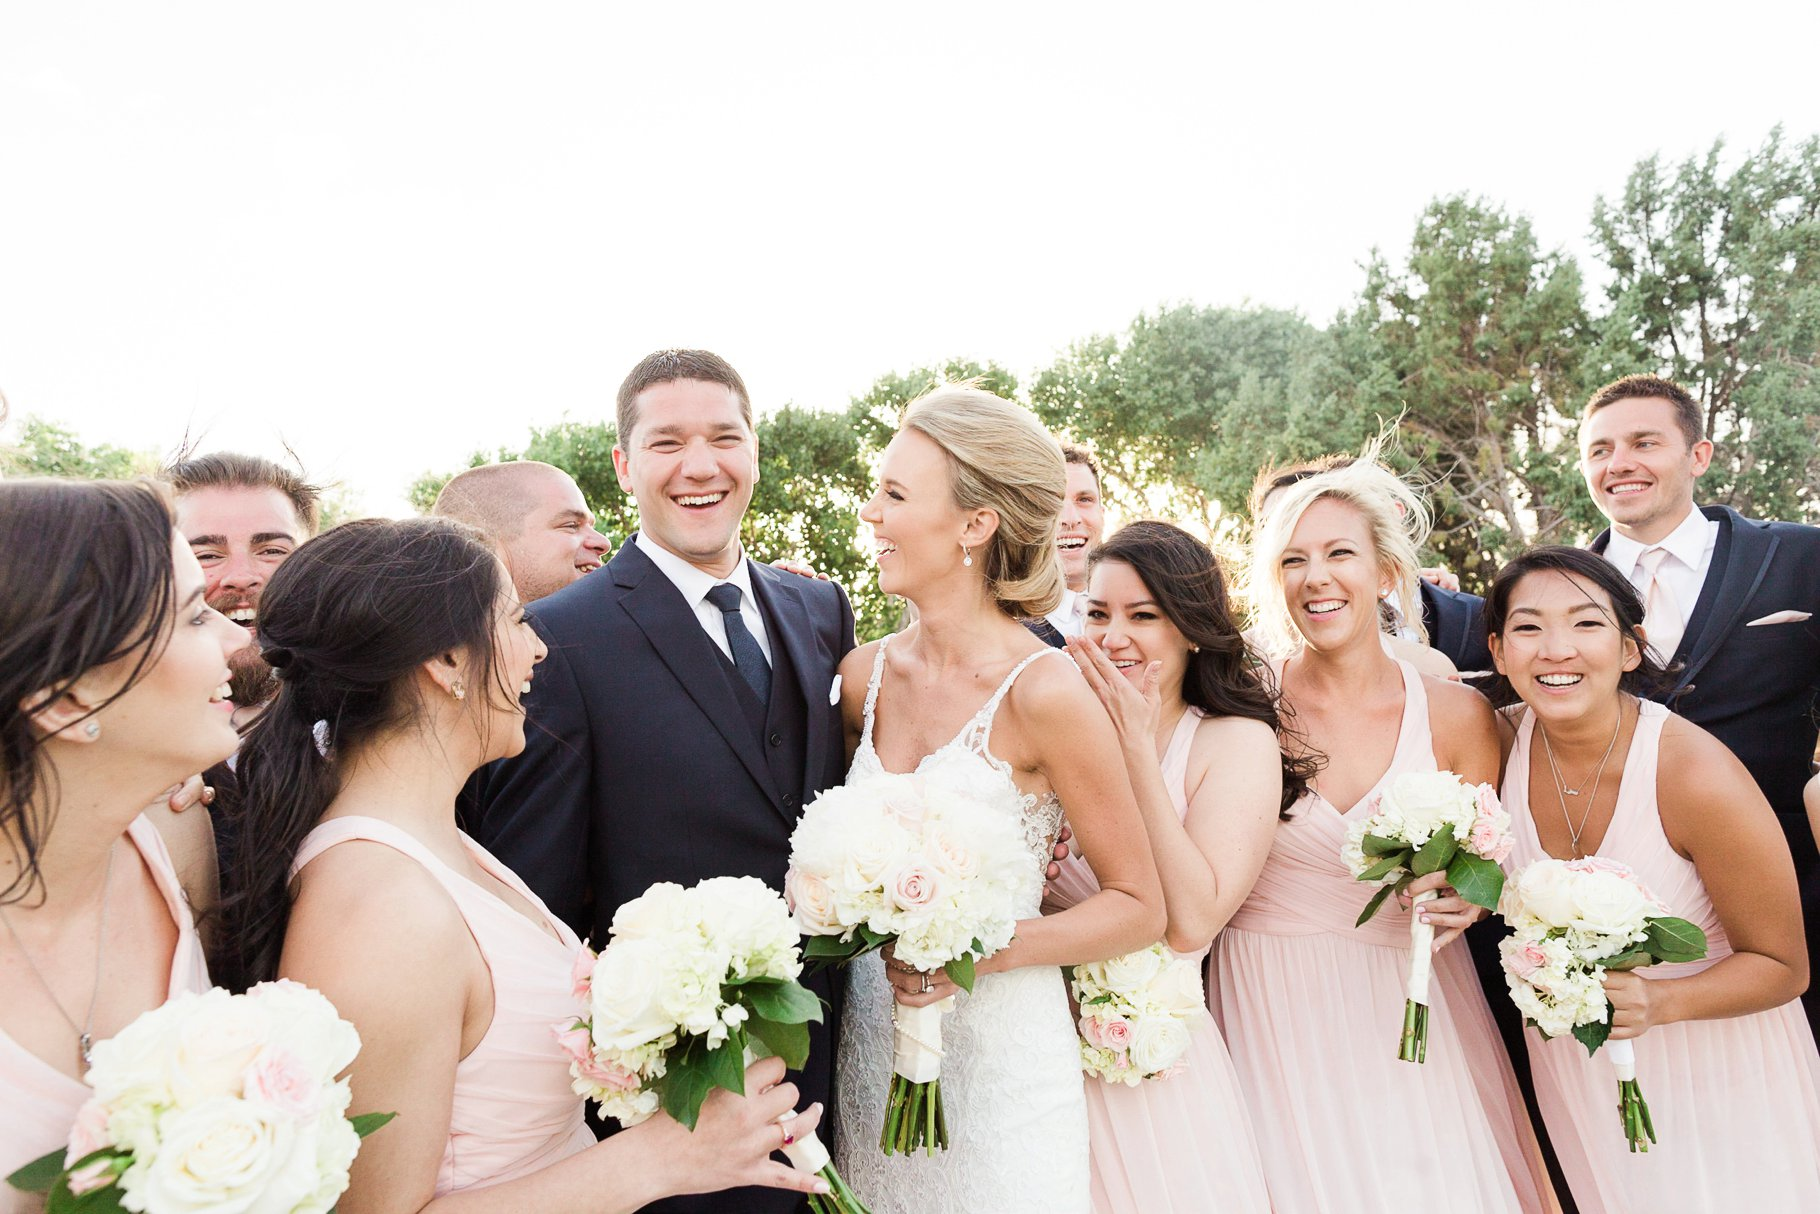 sedona wedding-102_GRETCHEN WAKEMAN PHOTOGRAPHY.jpg